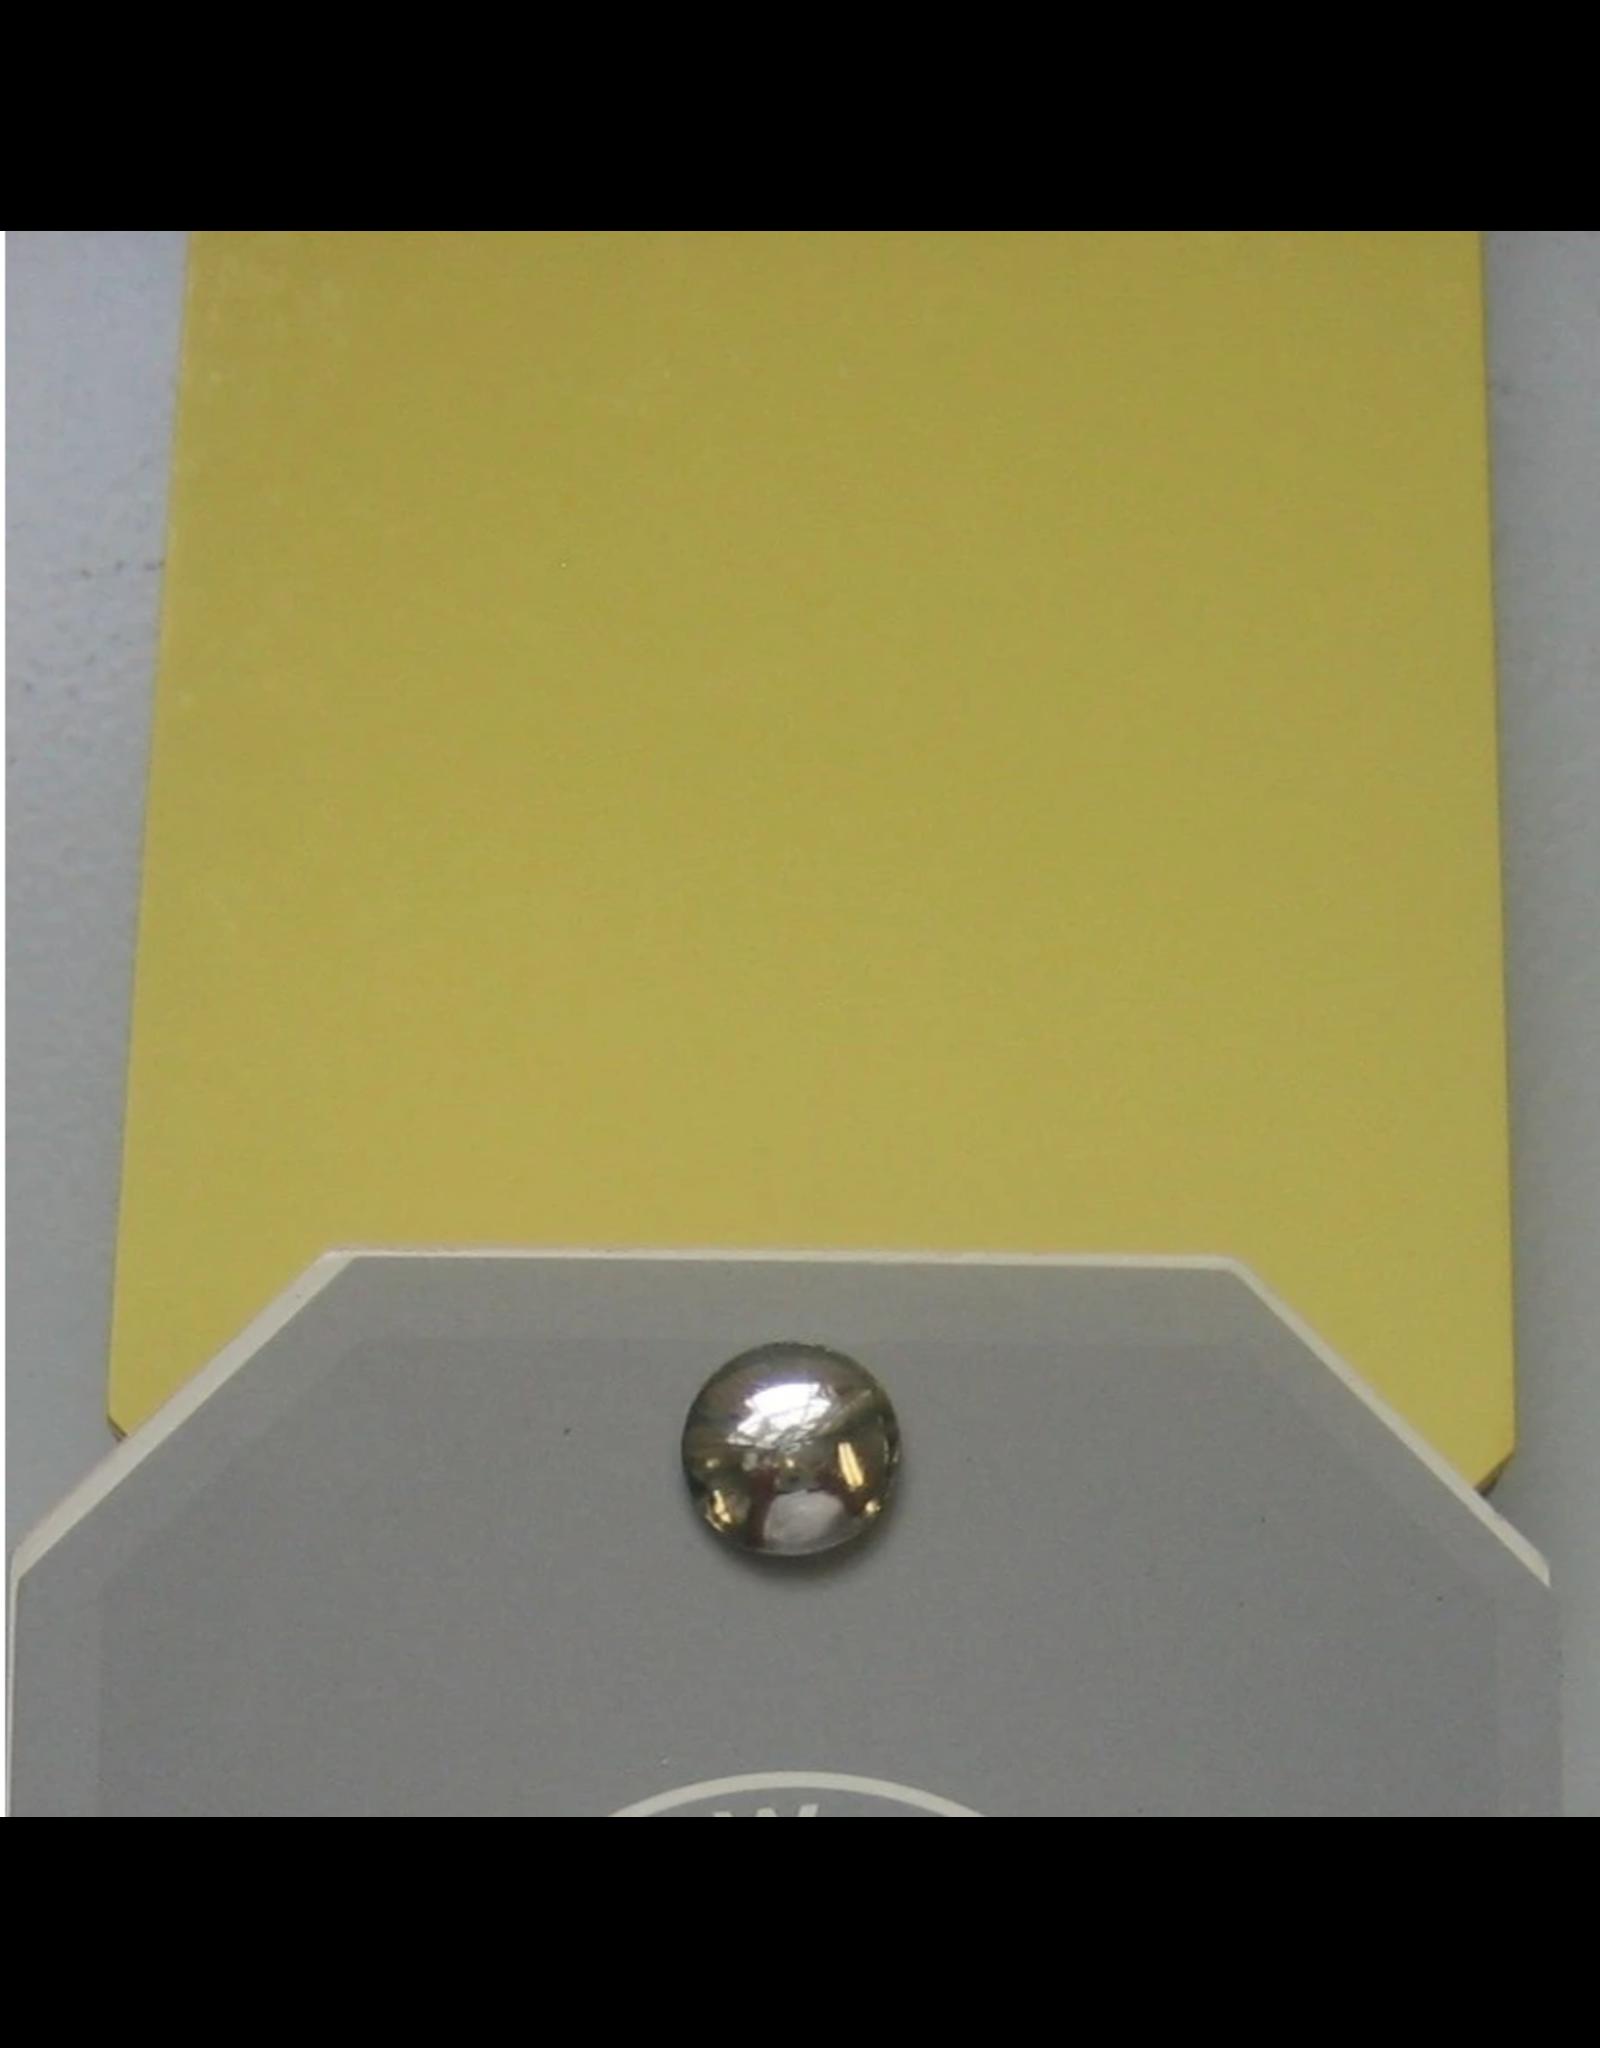 Farrow and Ball Gallon Modern Emulsion No 9914 Sherbert Lemon